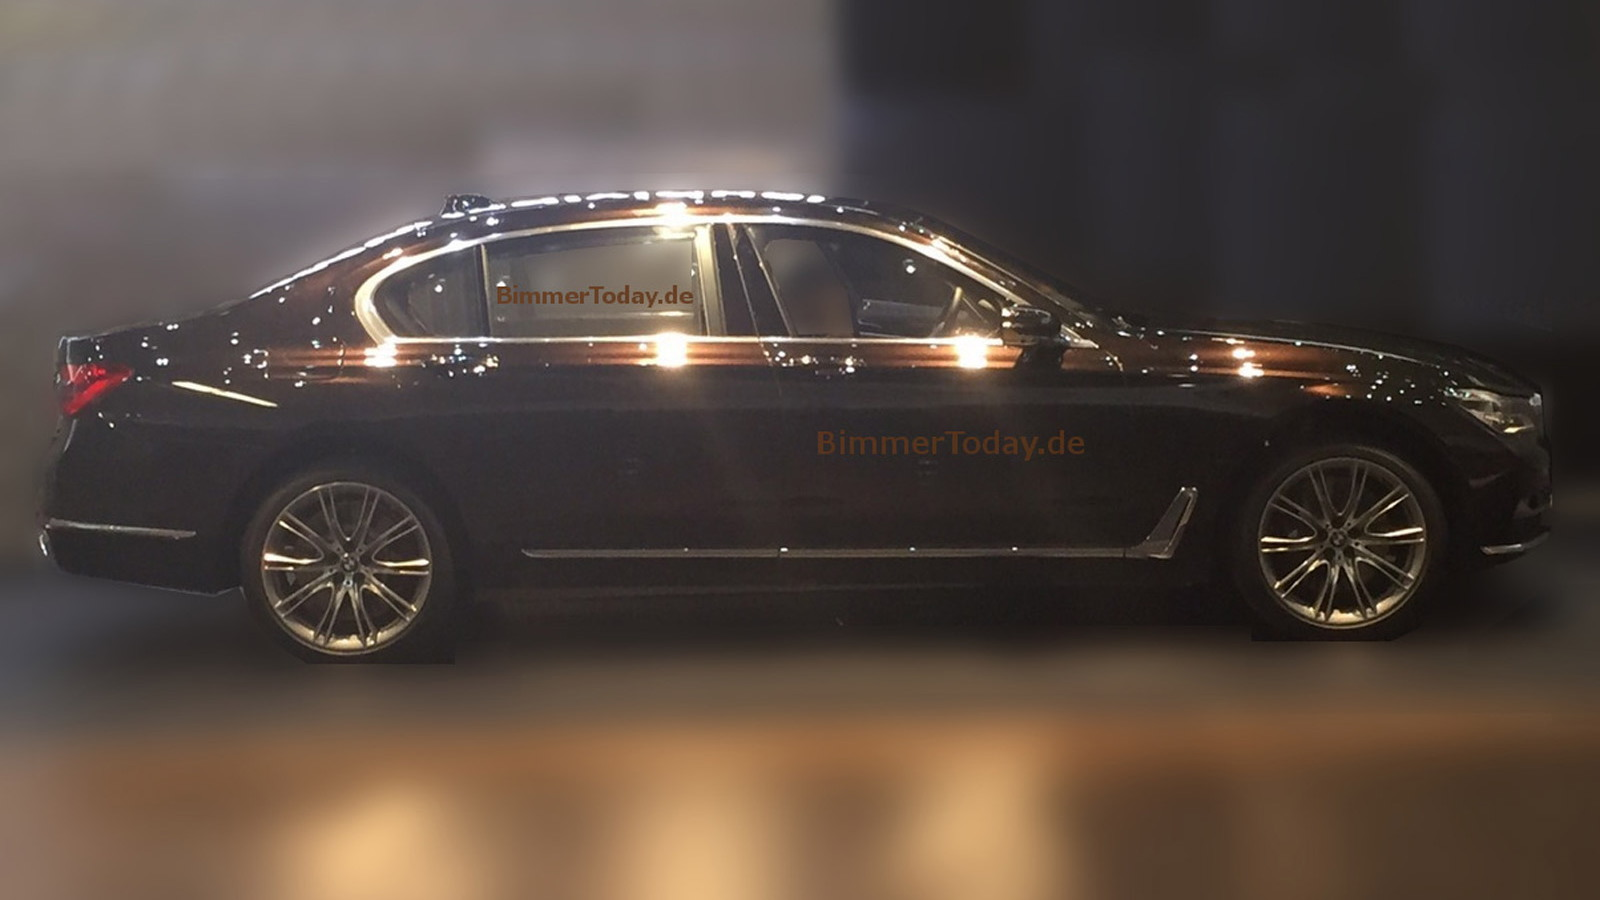 2016 BMW 7-Series leaked - Image via BimmerToday